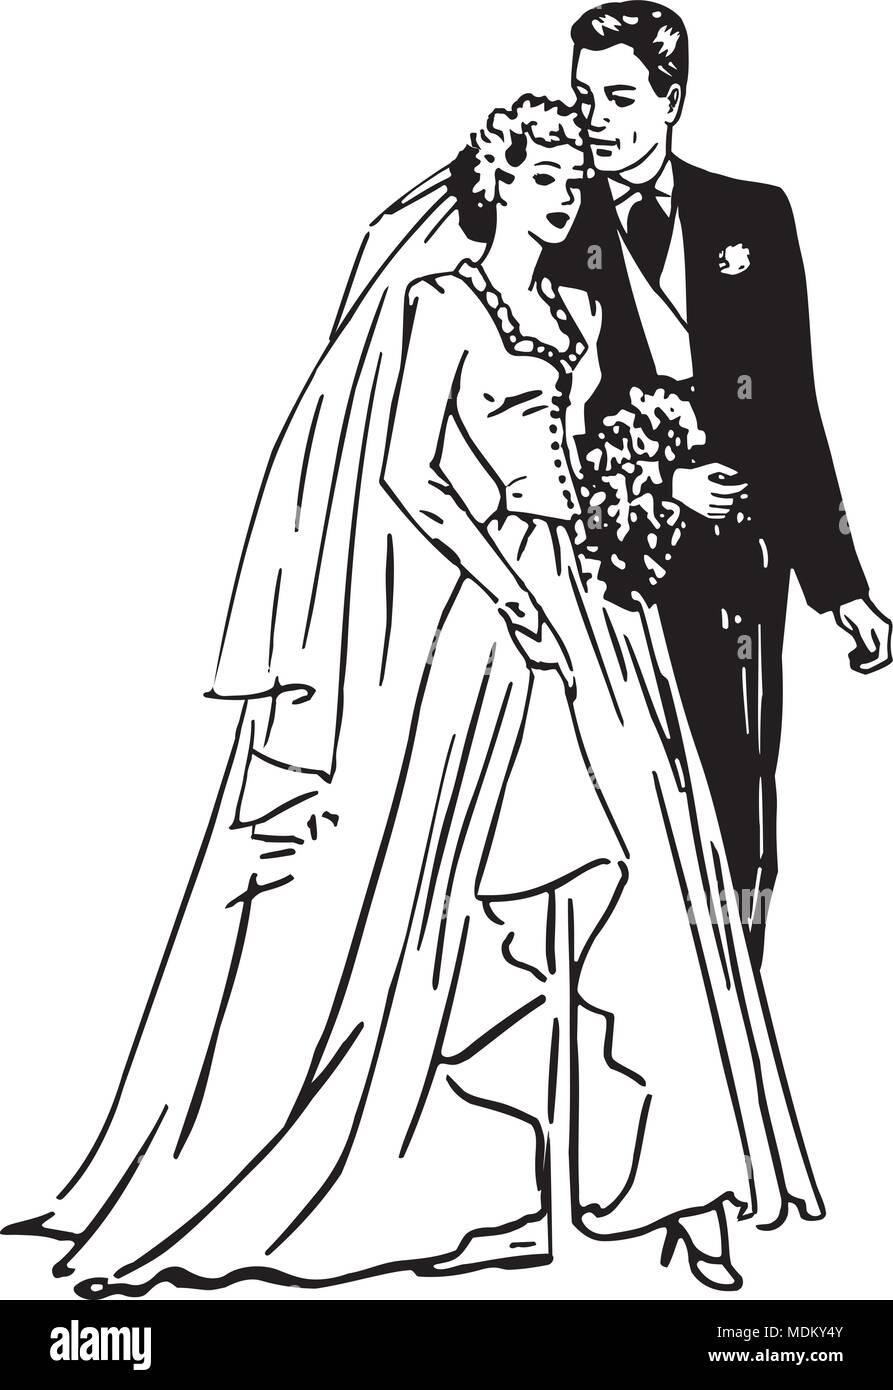 medium resolution of bride and groom retro clipart illustration